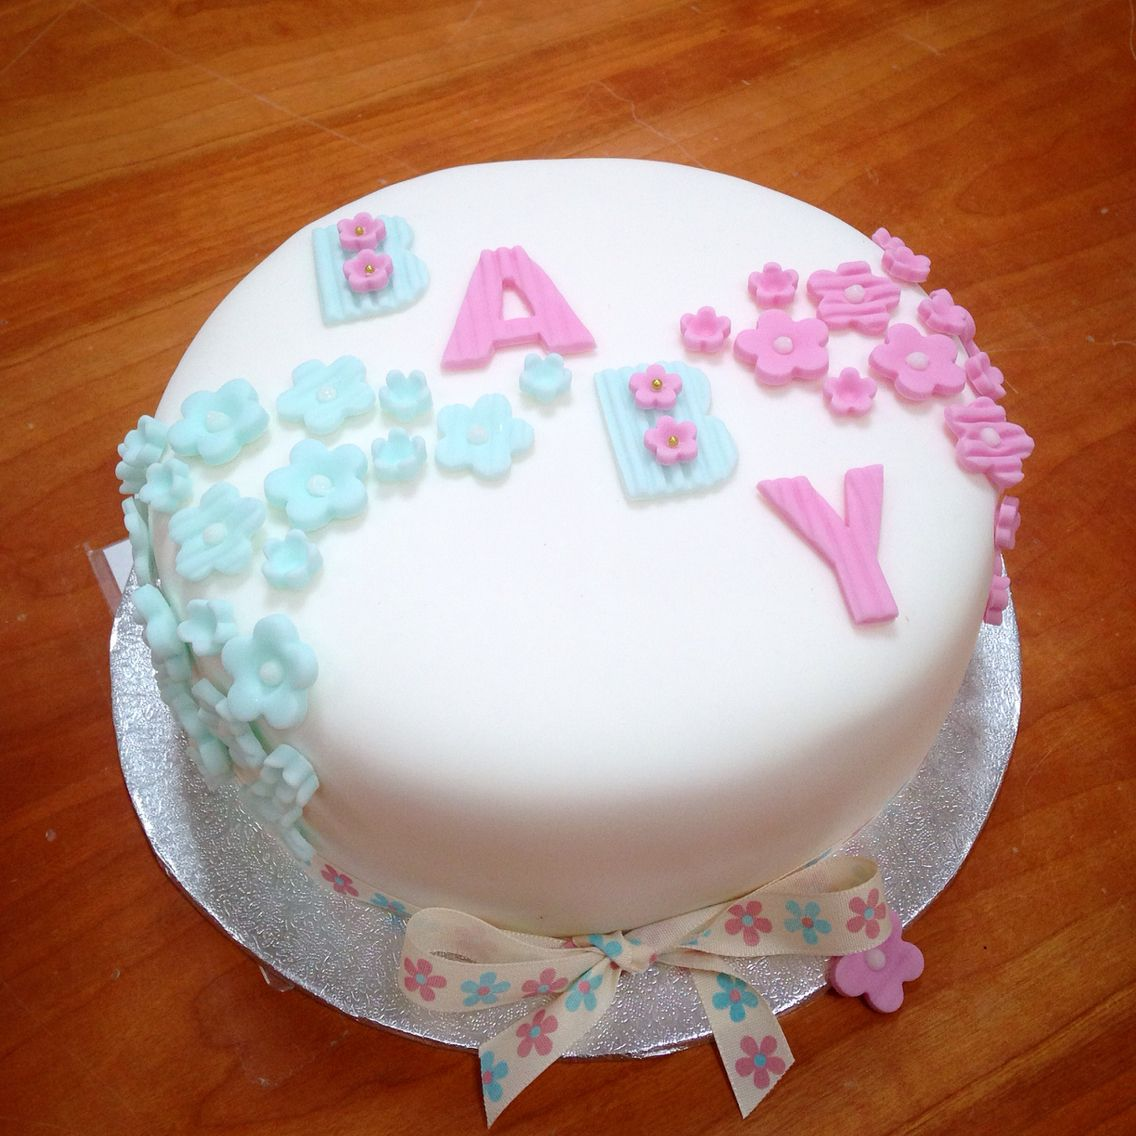 Unisex Baby Shower Cake With Images Unisex Baby Shower Cakes